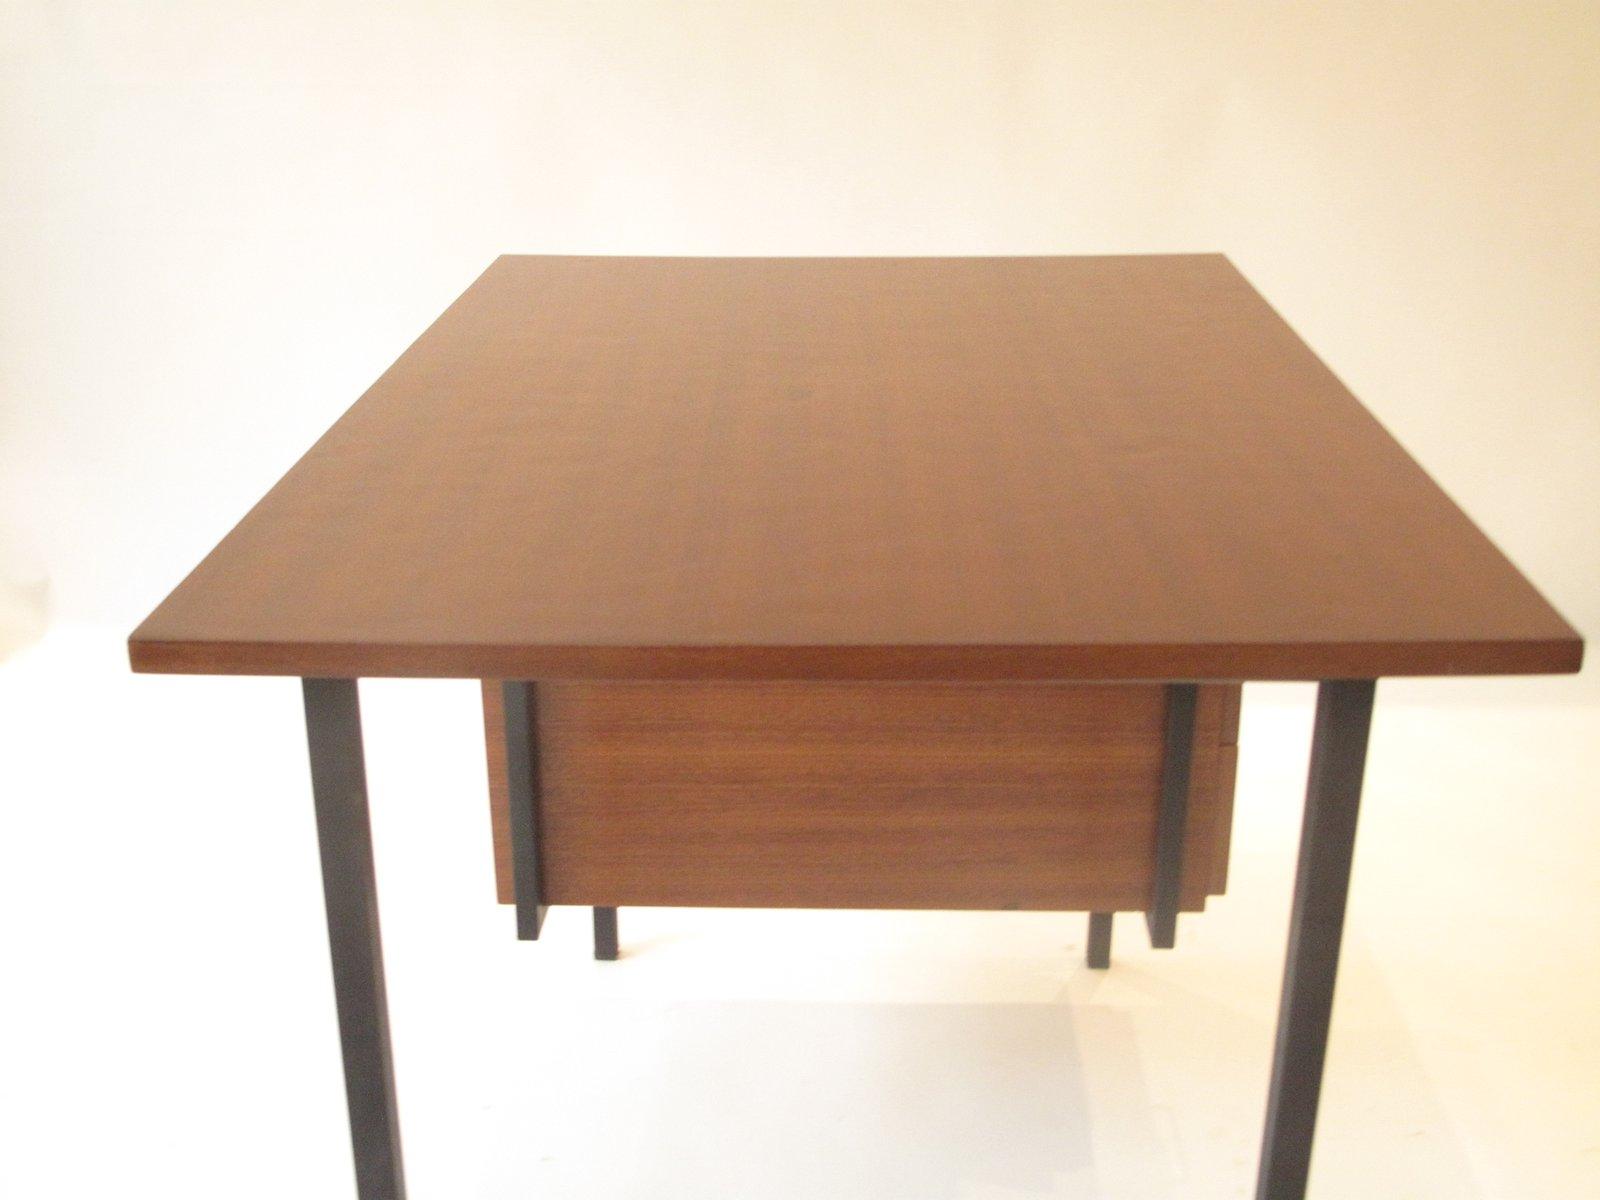 Schreibtisch Holz Metall 2021